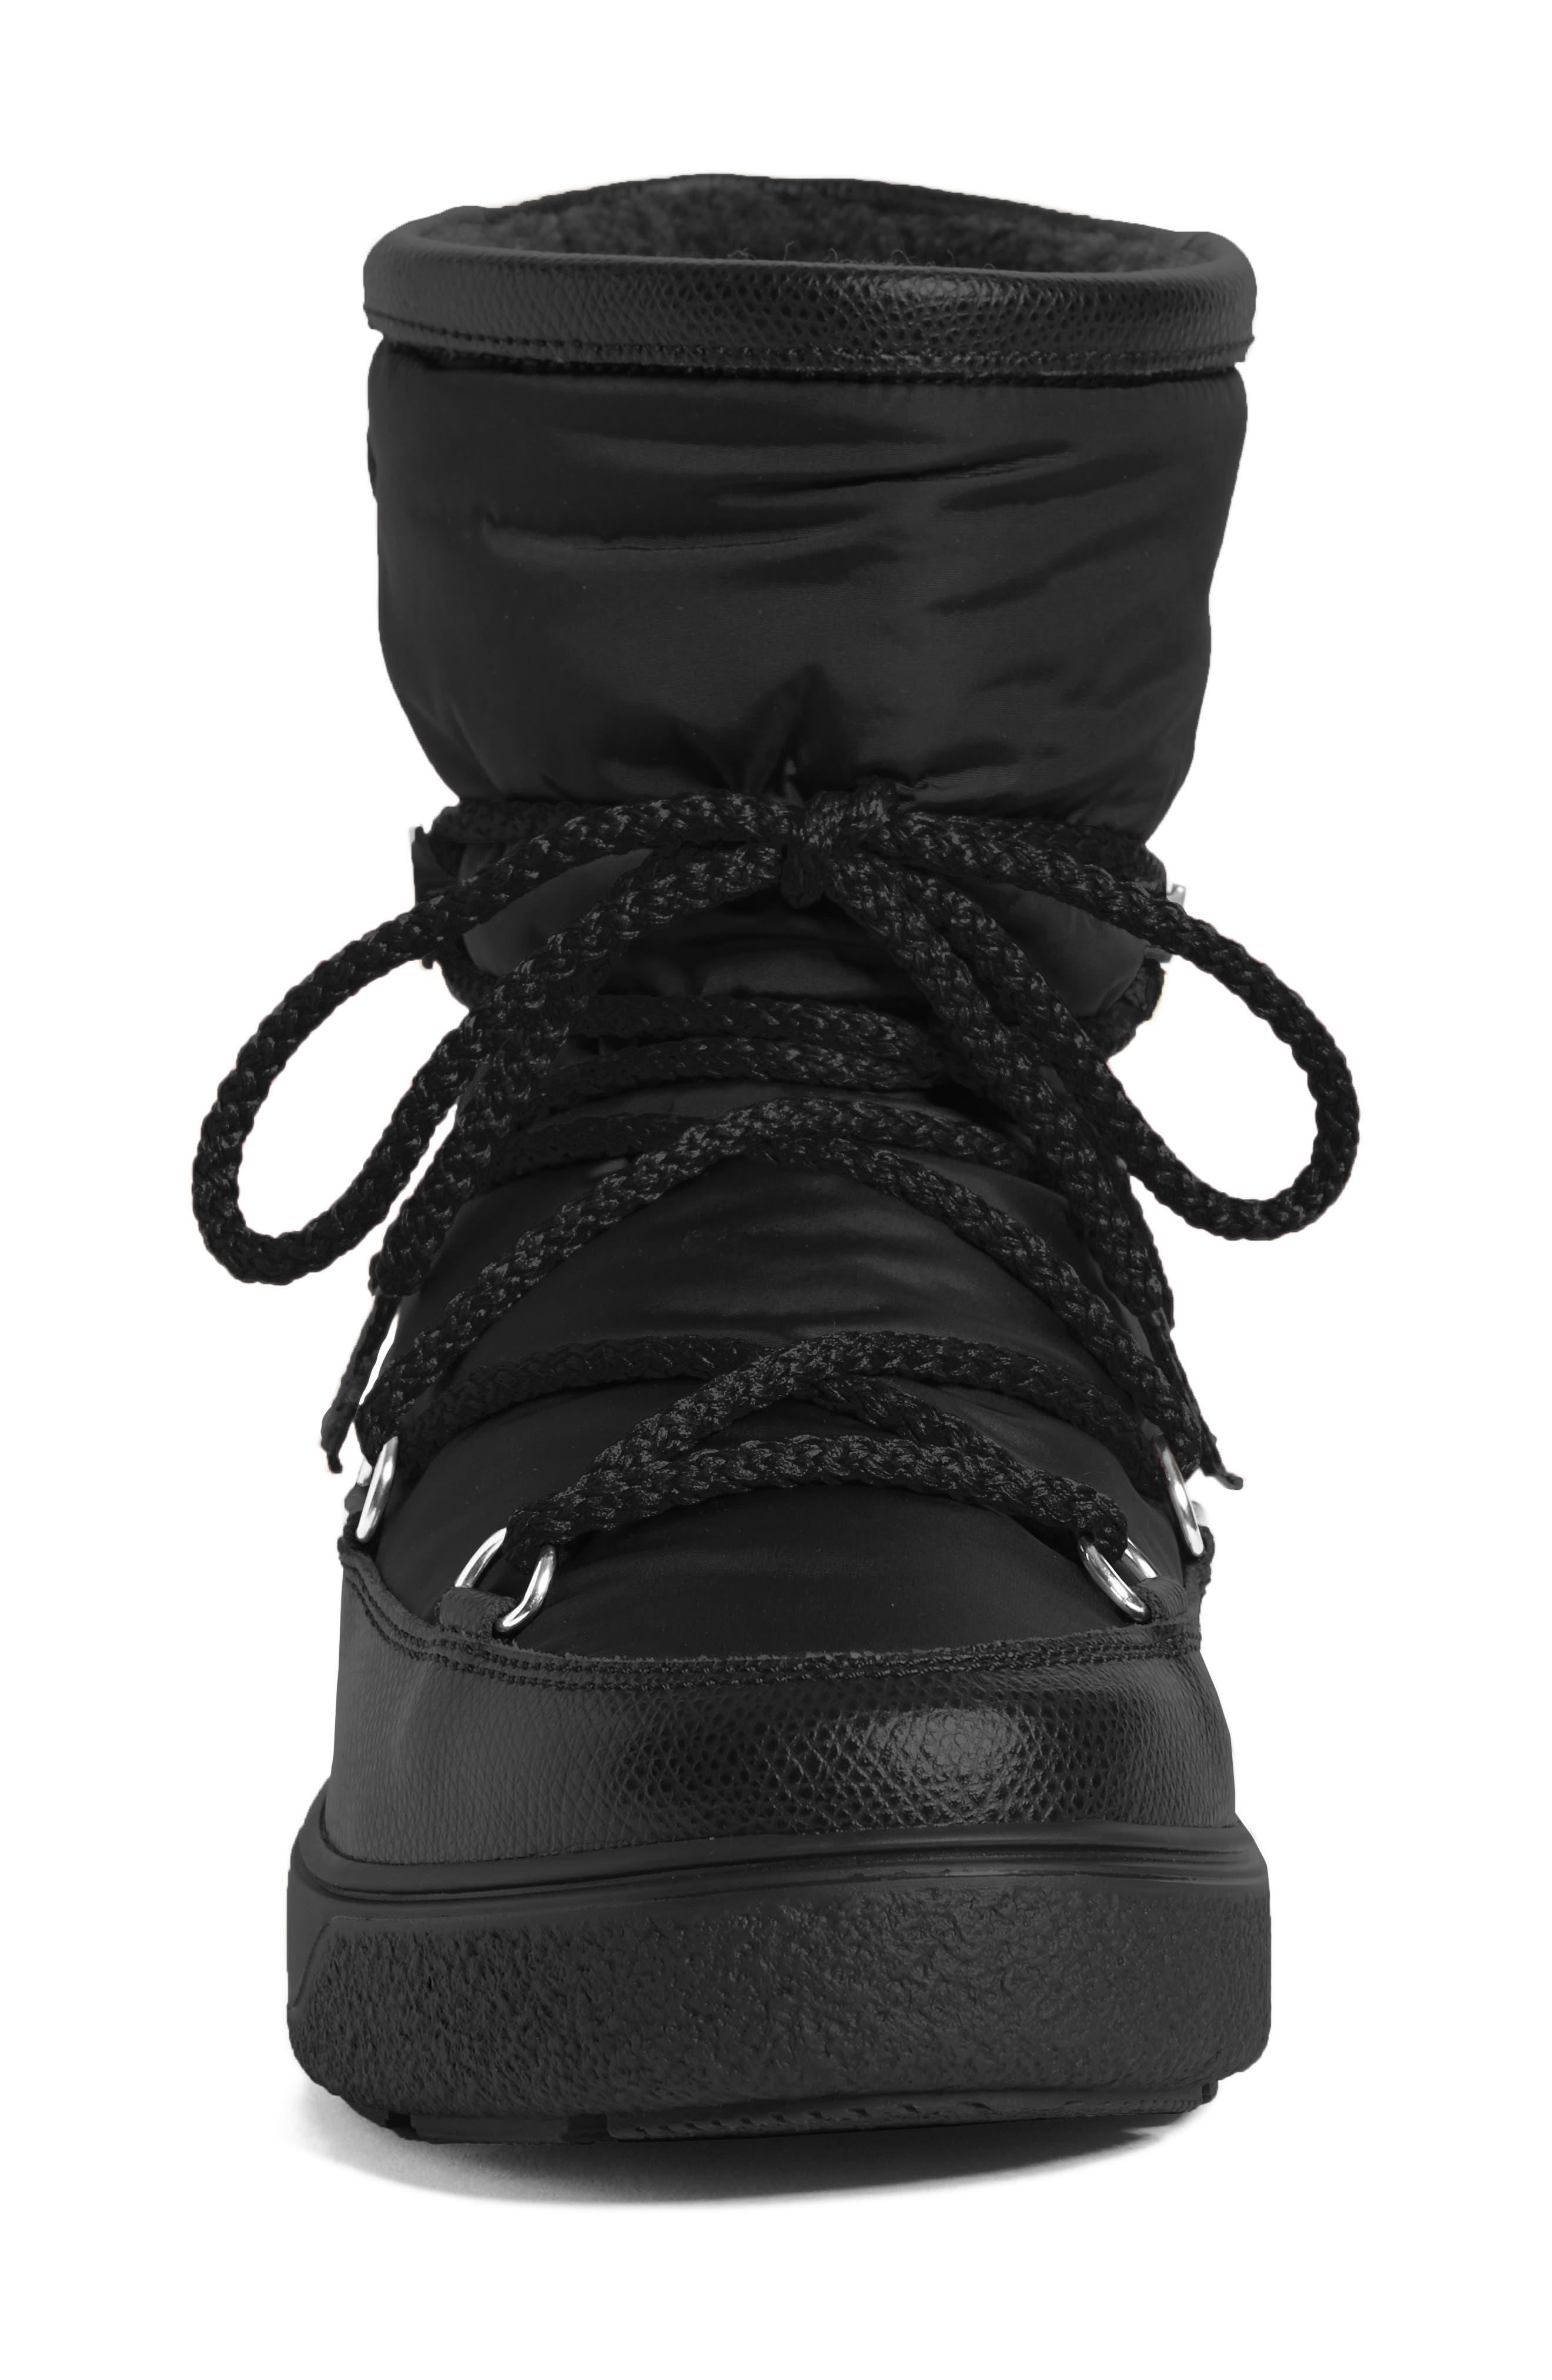 New Fanny Stivale Short Boots,                             Alternate thumbnail 4, color,                             001